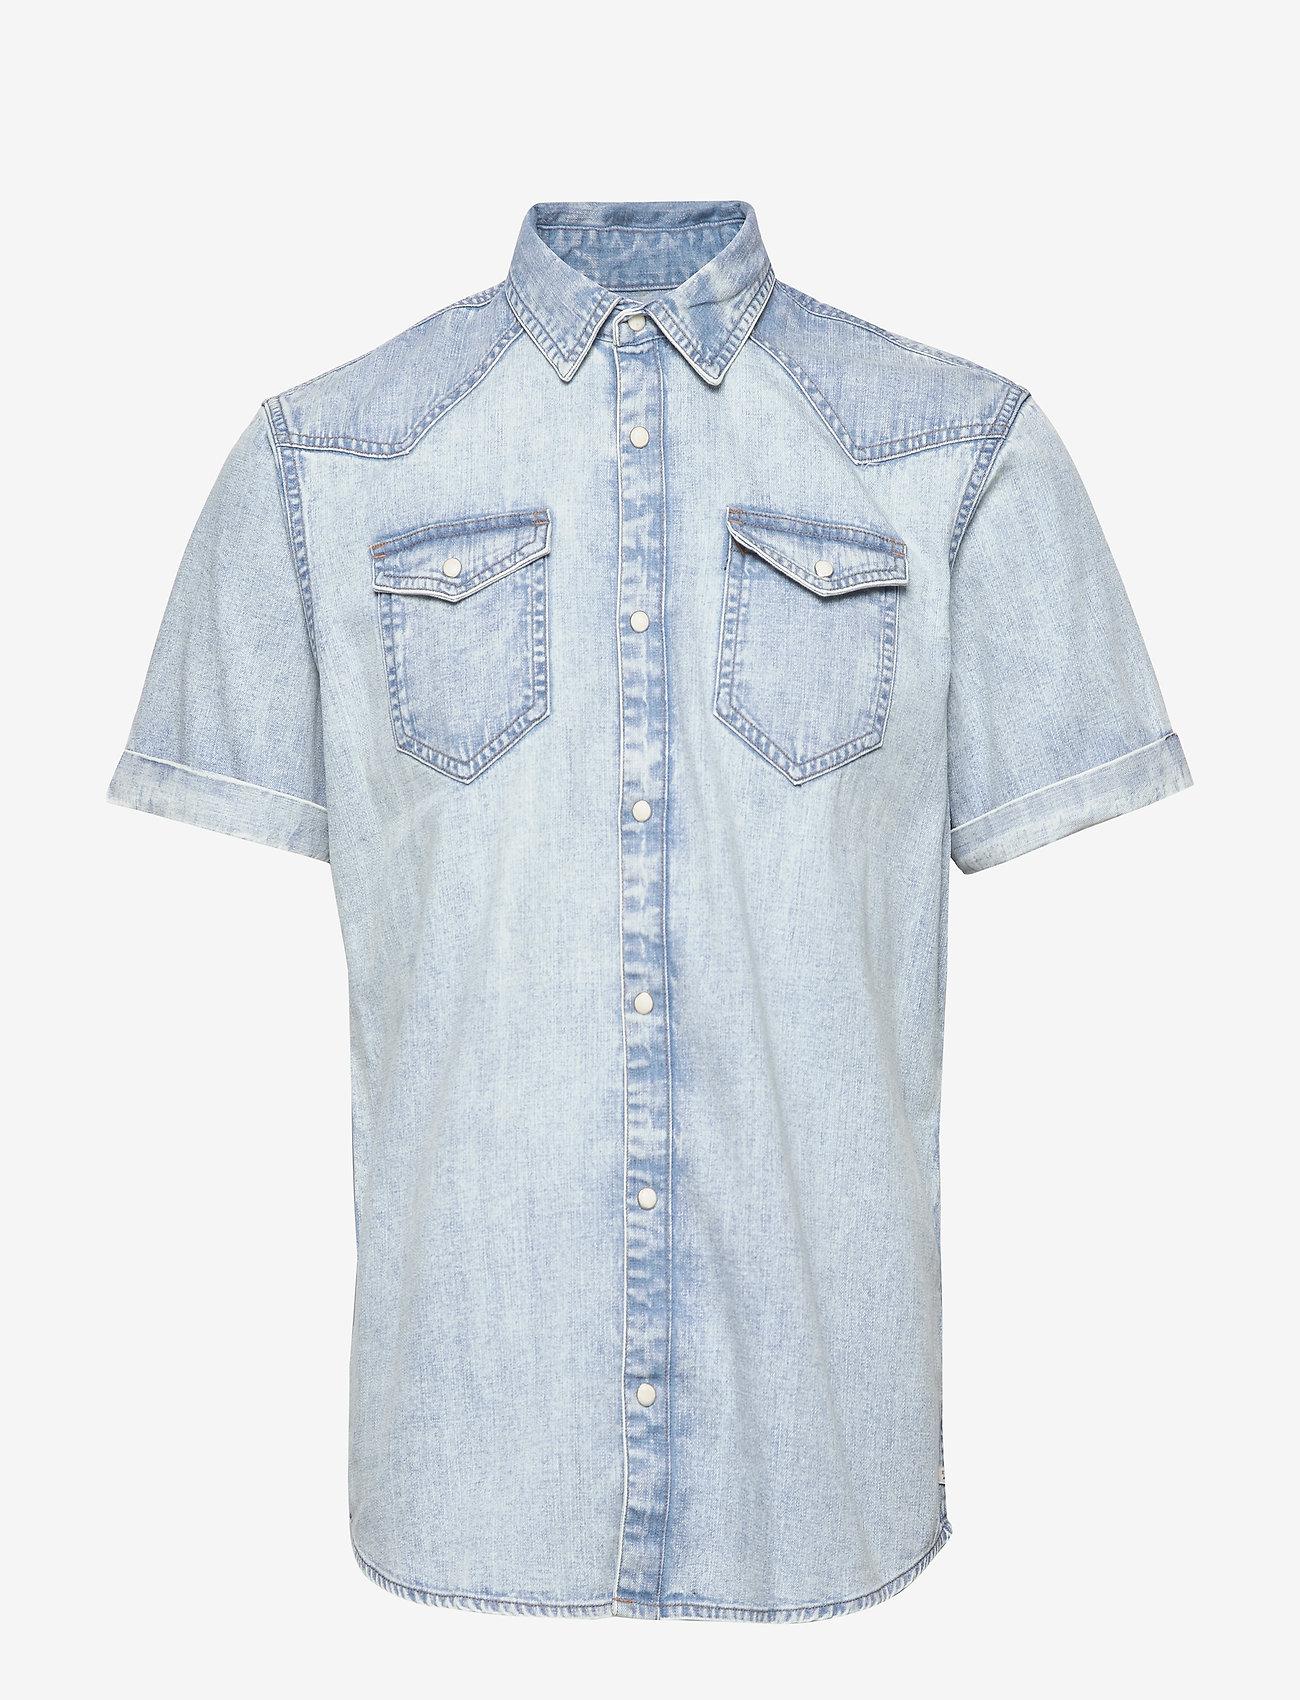 Scotch & Soda - Ams Blauw short sleeve denim western shirt with seasonal was - denimskjorter - bleached indigo - 0